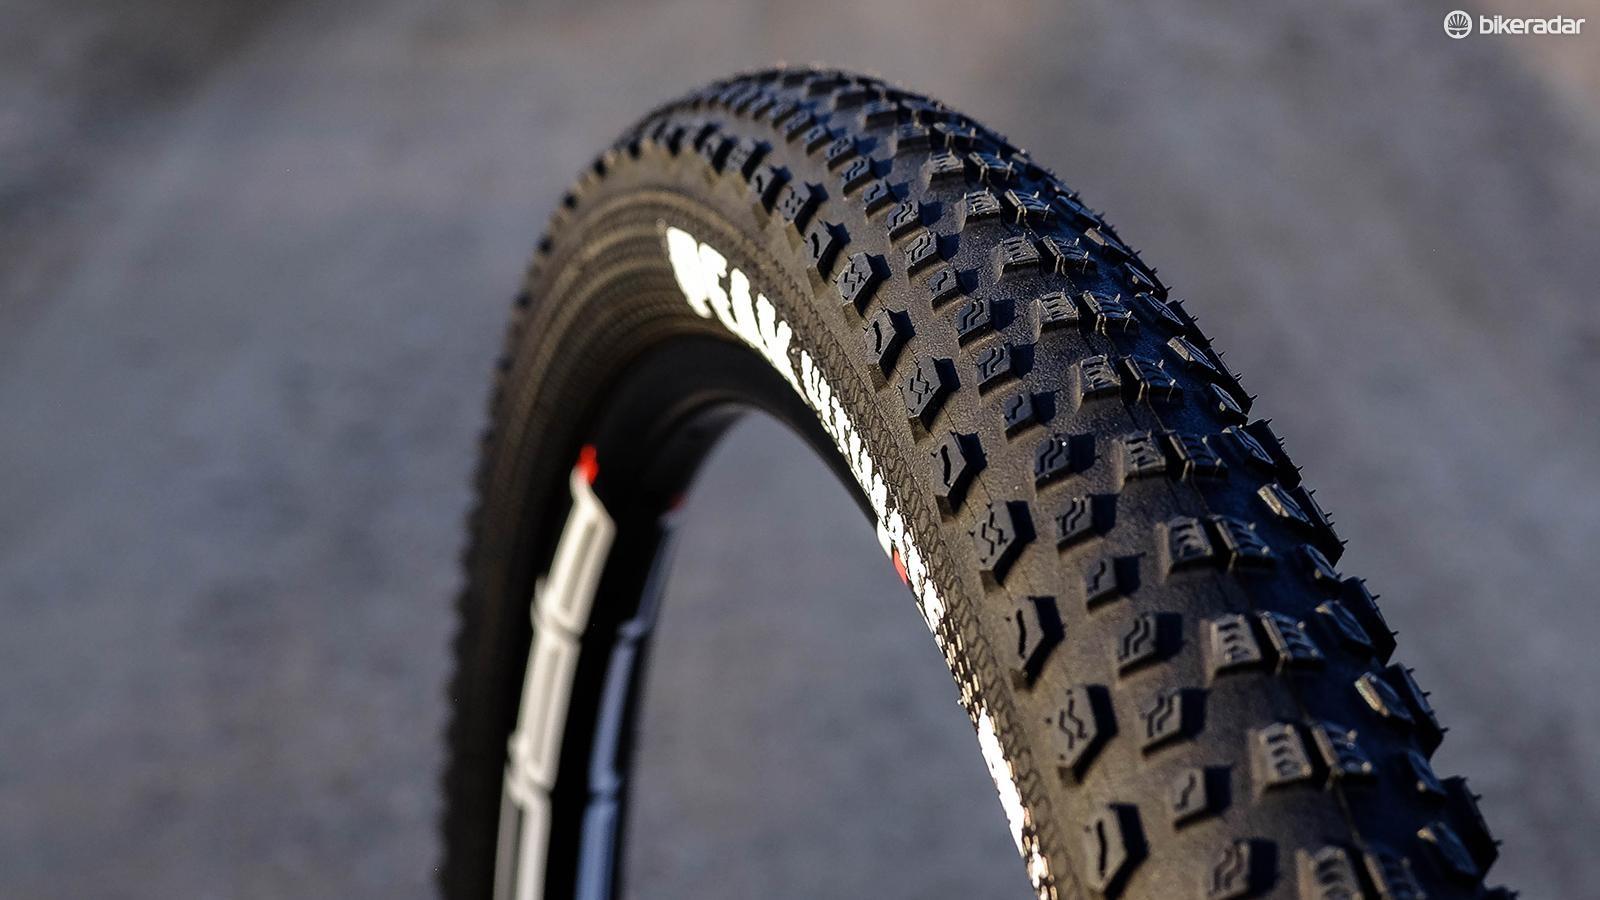 The Peak cross-country tire